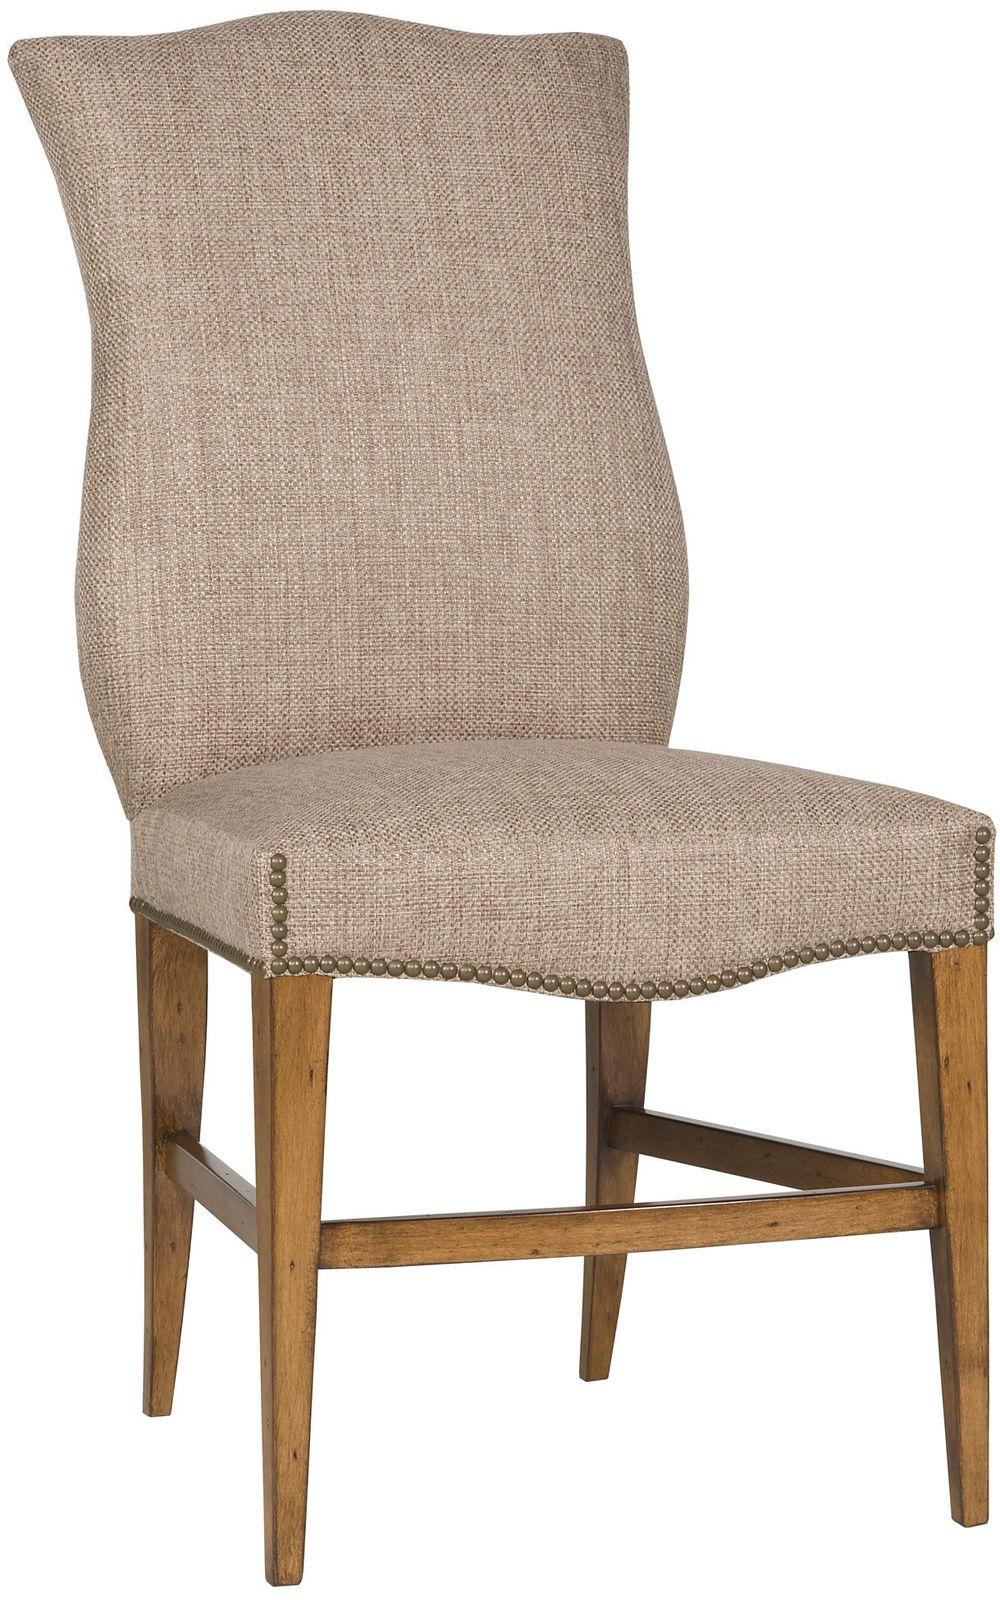 Vanguard Furniture - Ruby Side Chair